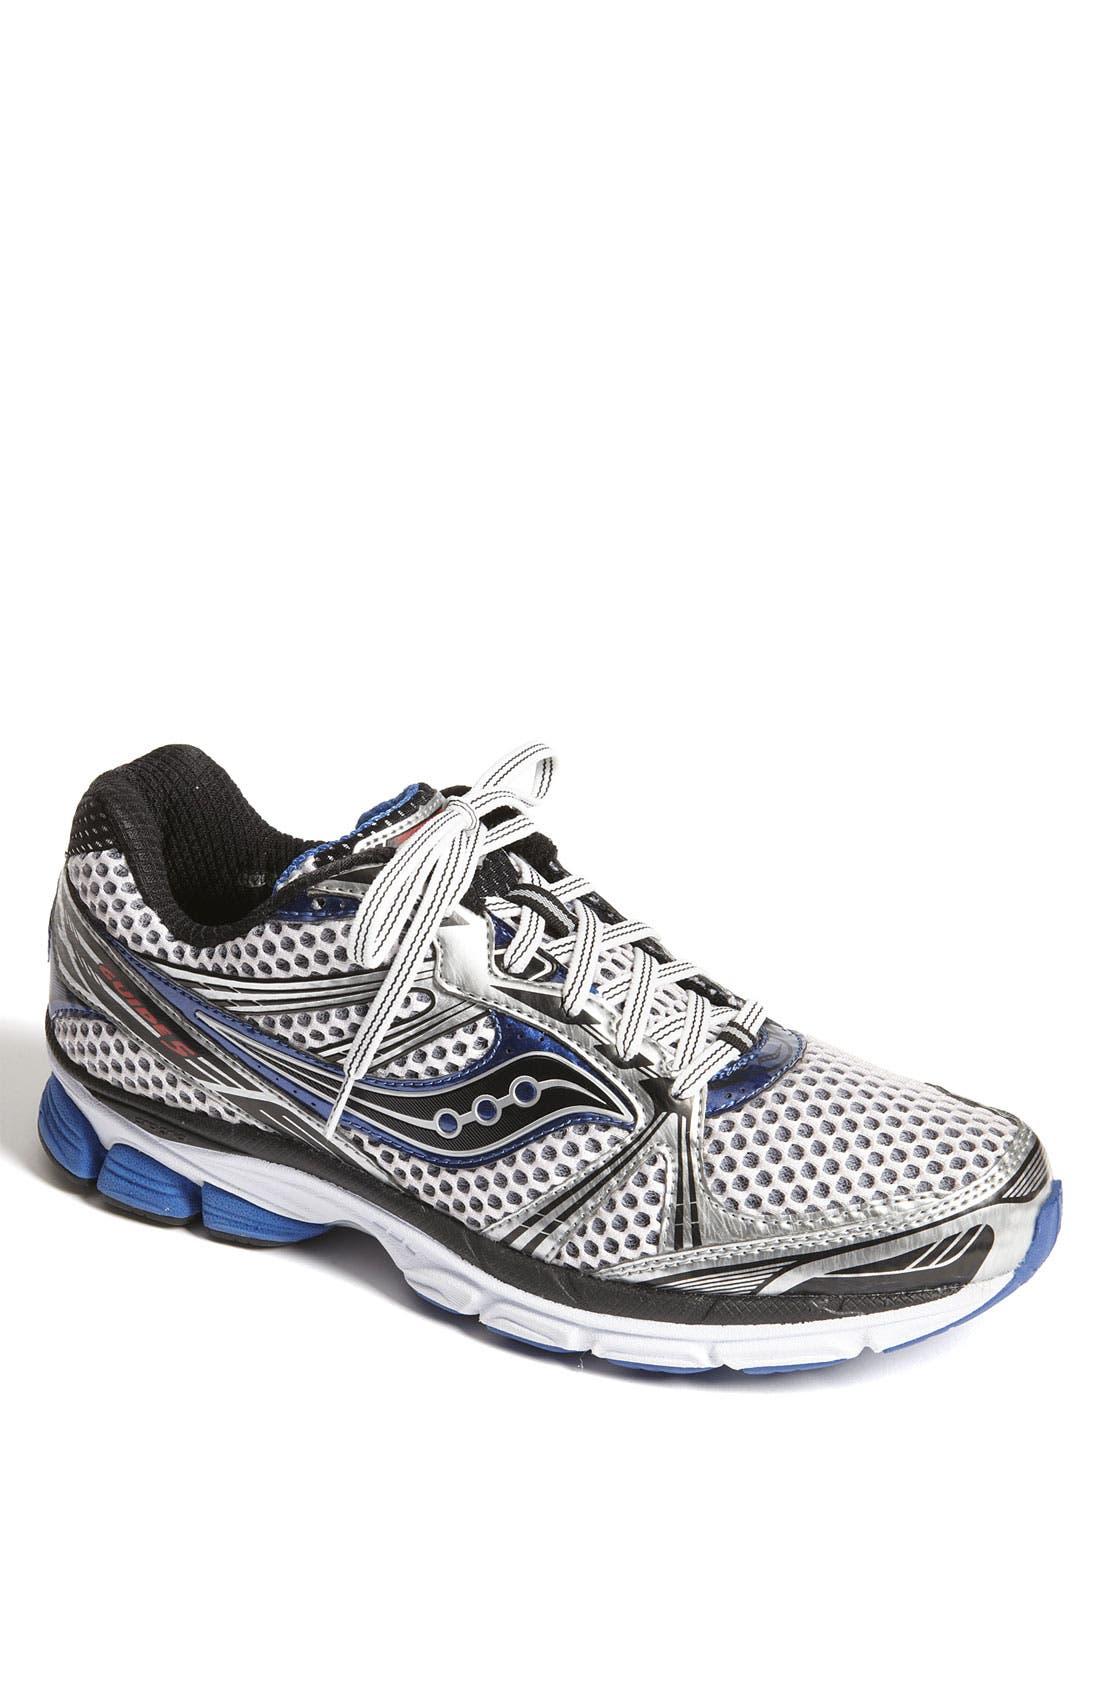 Alternate Image 1 Selected - Saucony 'ProGrid Guide 5' Running Shoe (Men)